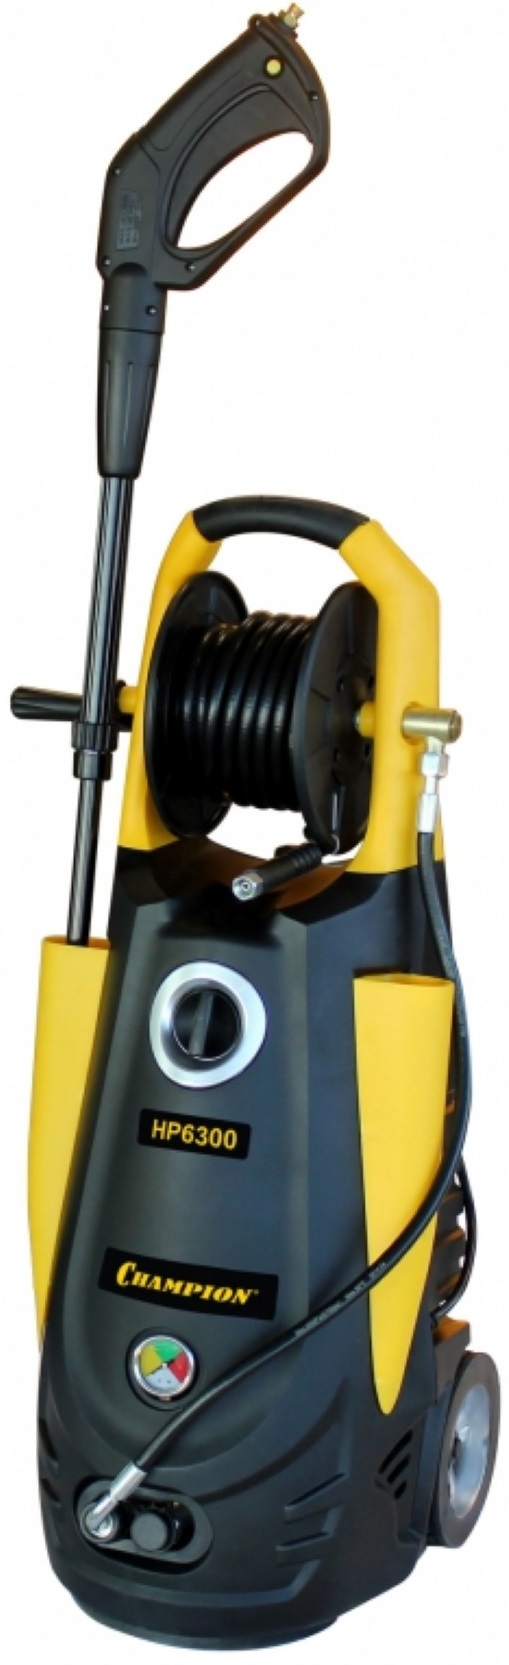 Champion HP6300 New - минимойка (Yellow/Black)